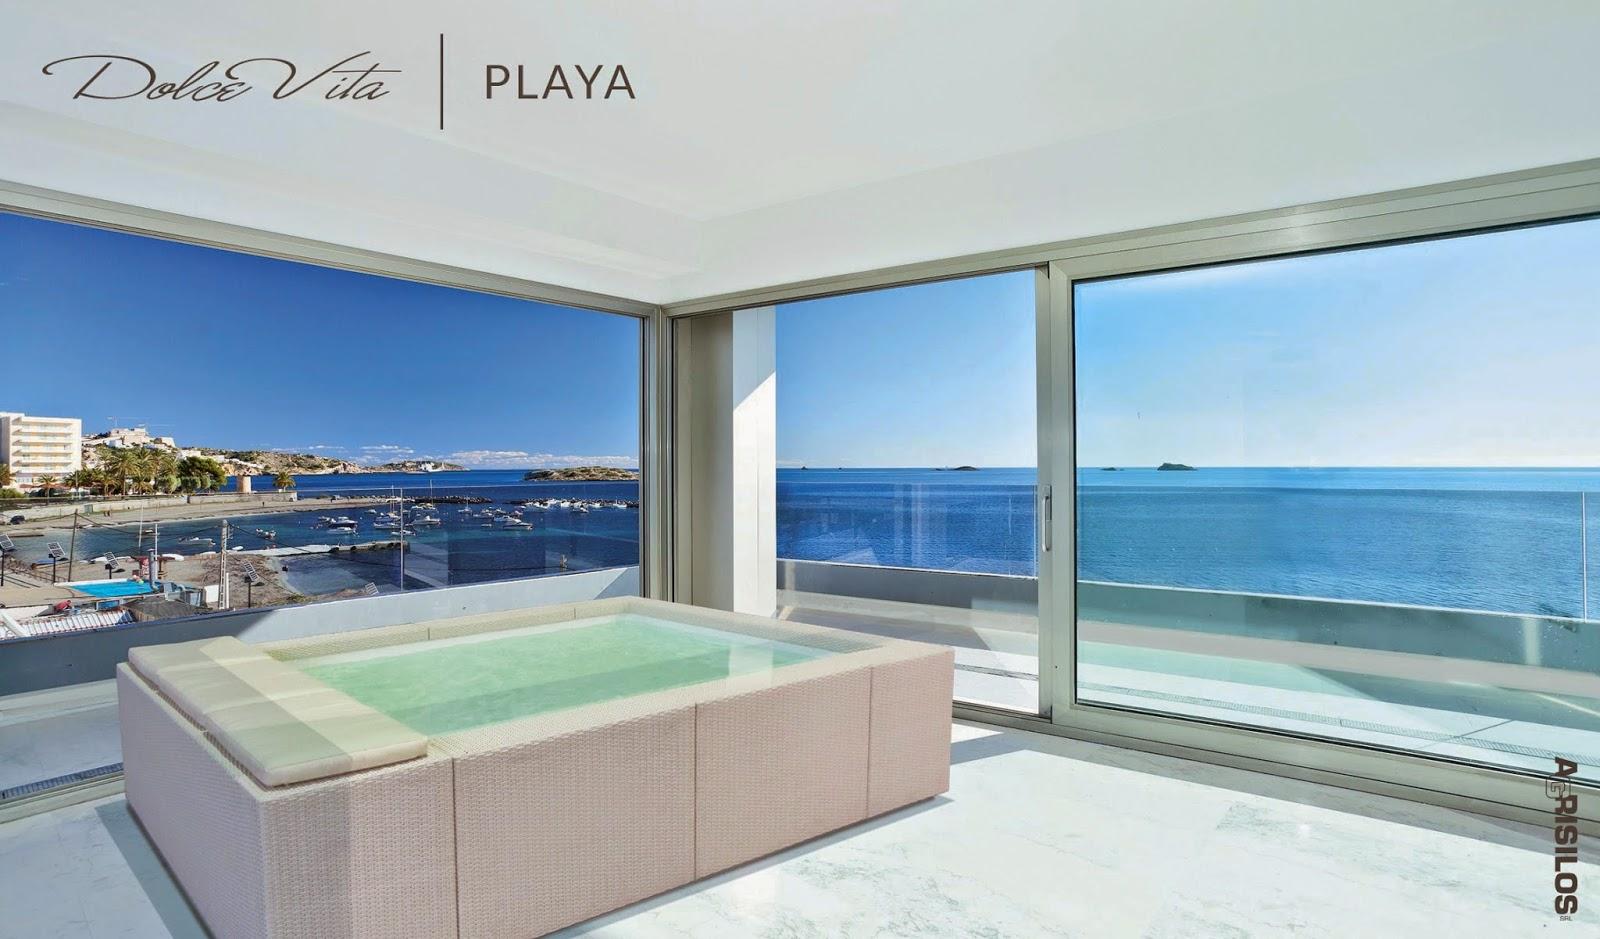 Nuova laghetto dolcevita playa piscine laghetto news blog for Laghetto da interno